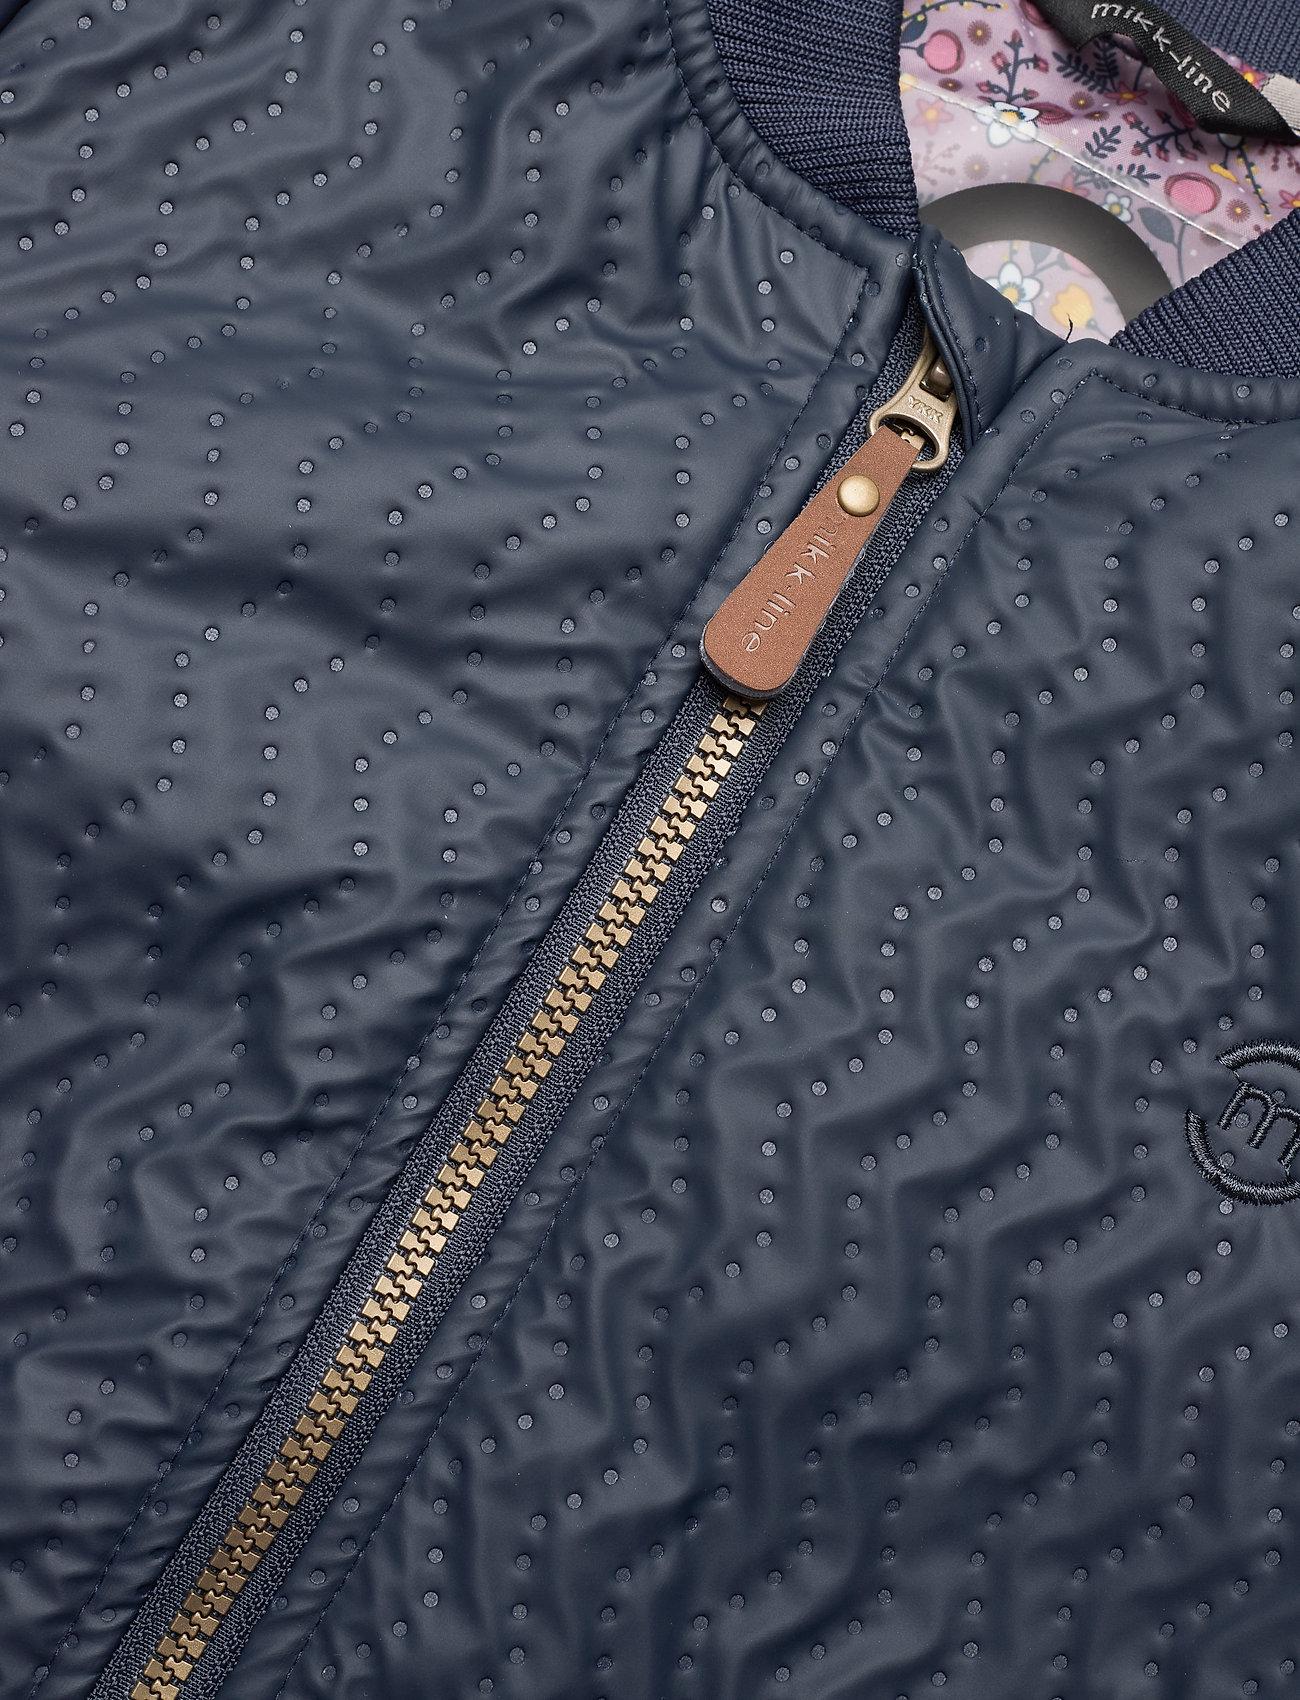 Mikk-line Duvet Girls Coat W. Printed Lining - Jackor Blue Nights